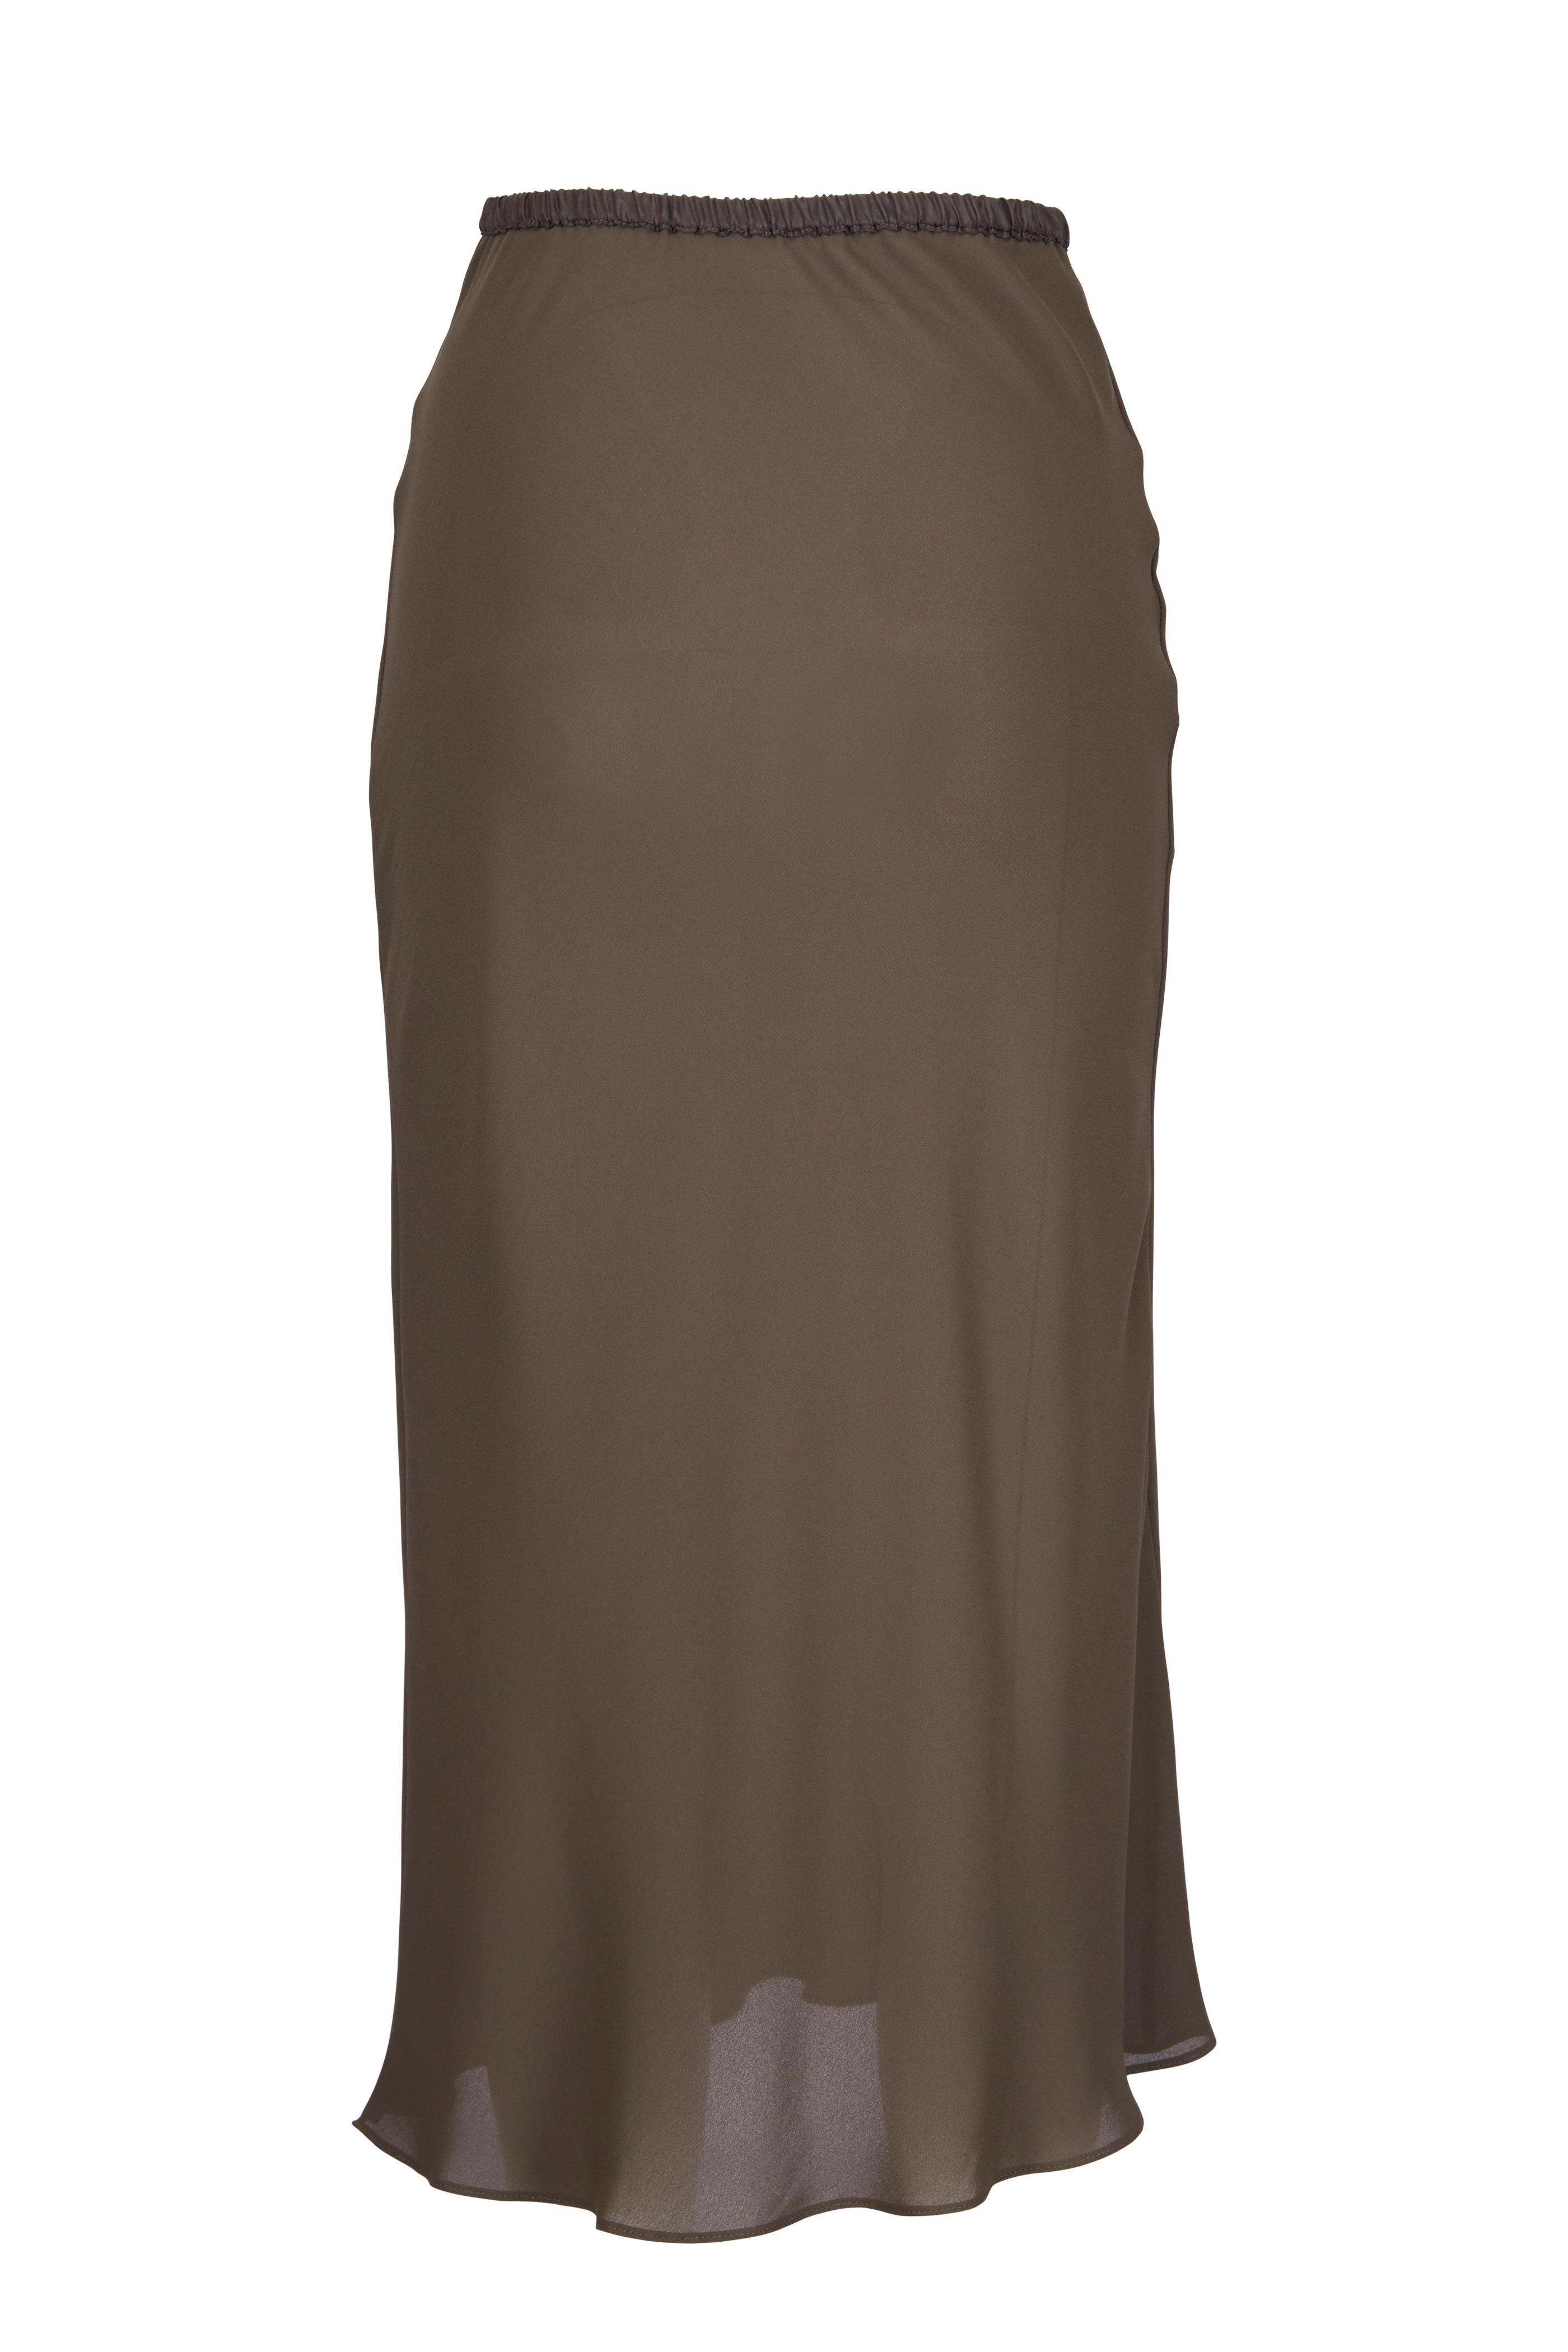 e4f01eae38e1 Peter Cohen - Dark Olive Green Bias Cut Skirt | Mitchell Stores